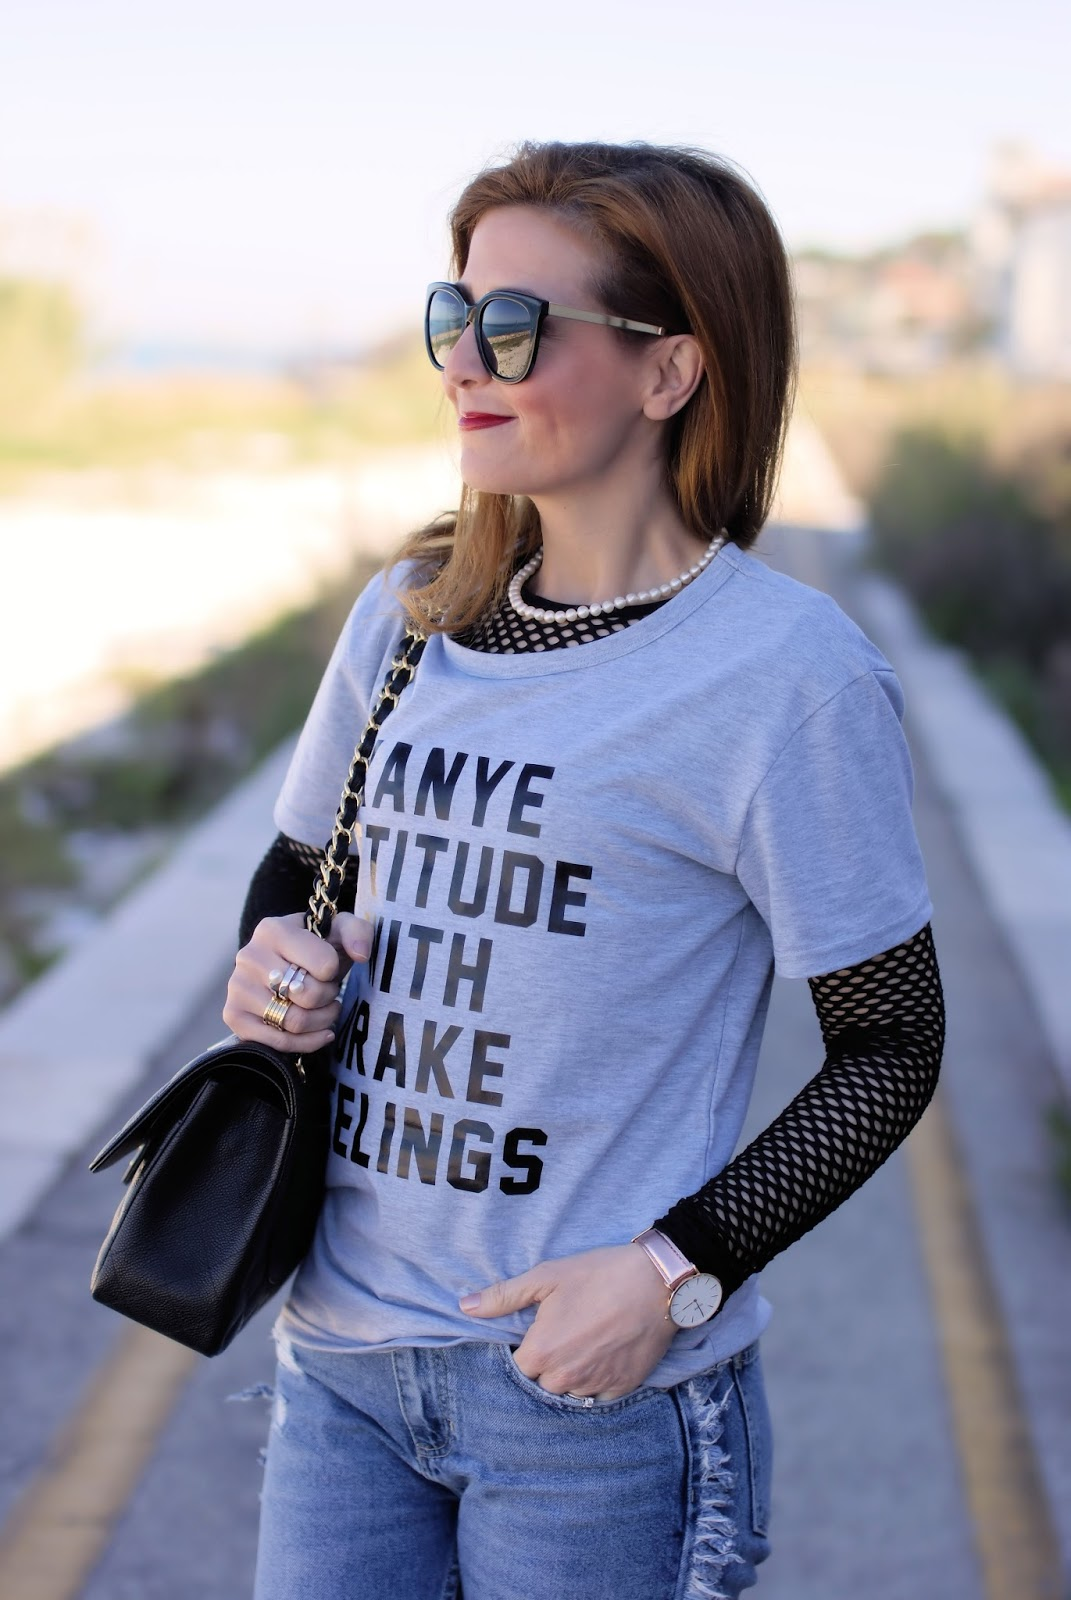 Kanye attitude with Drake feelings Sammydress tshirt on Fashion and Cookies fashion blog, fashion blogger style